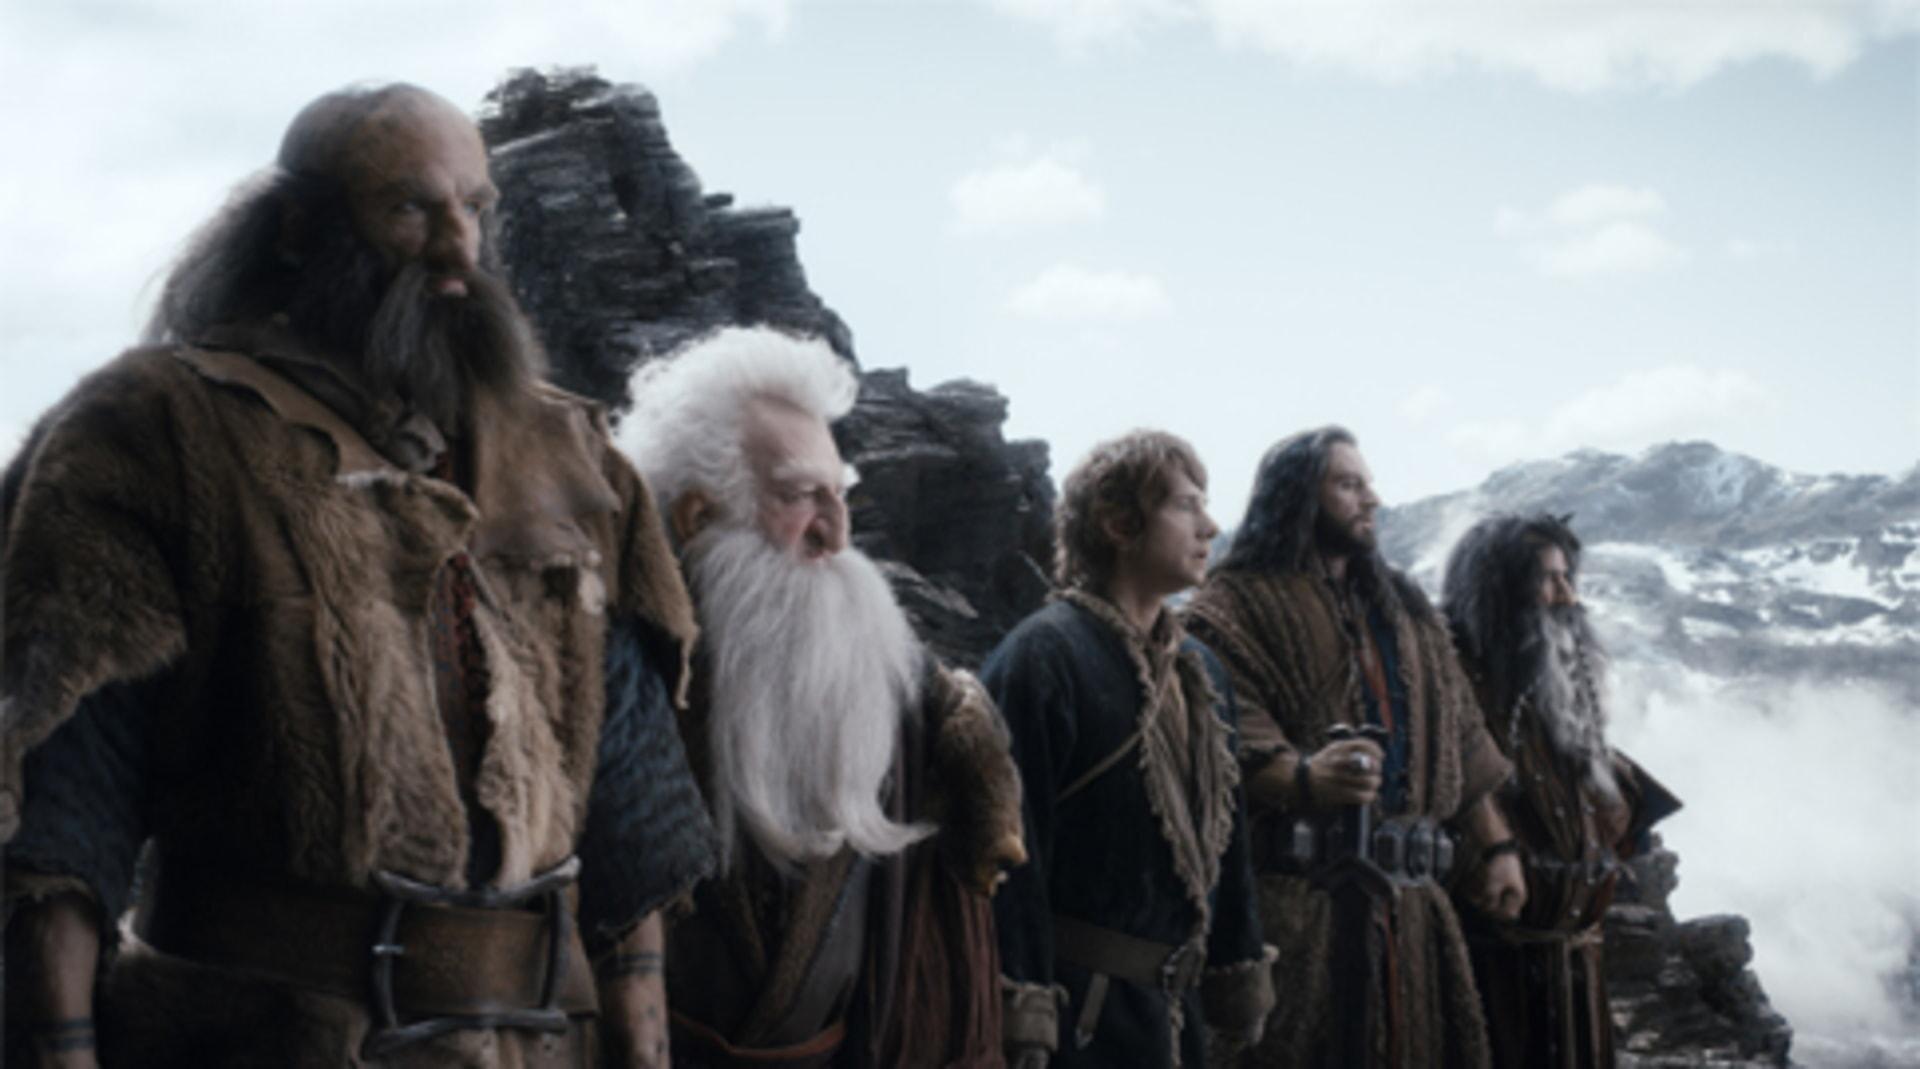 The Hobbit: The Desolation of Smaug - Image 10